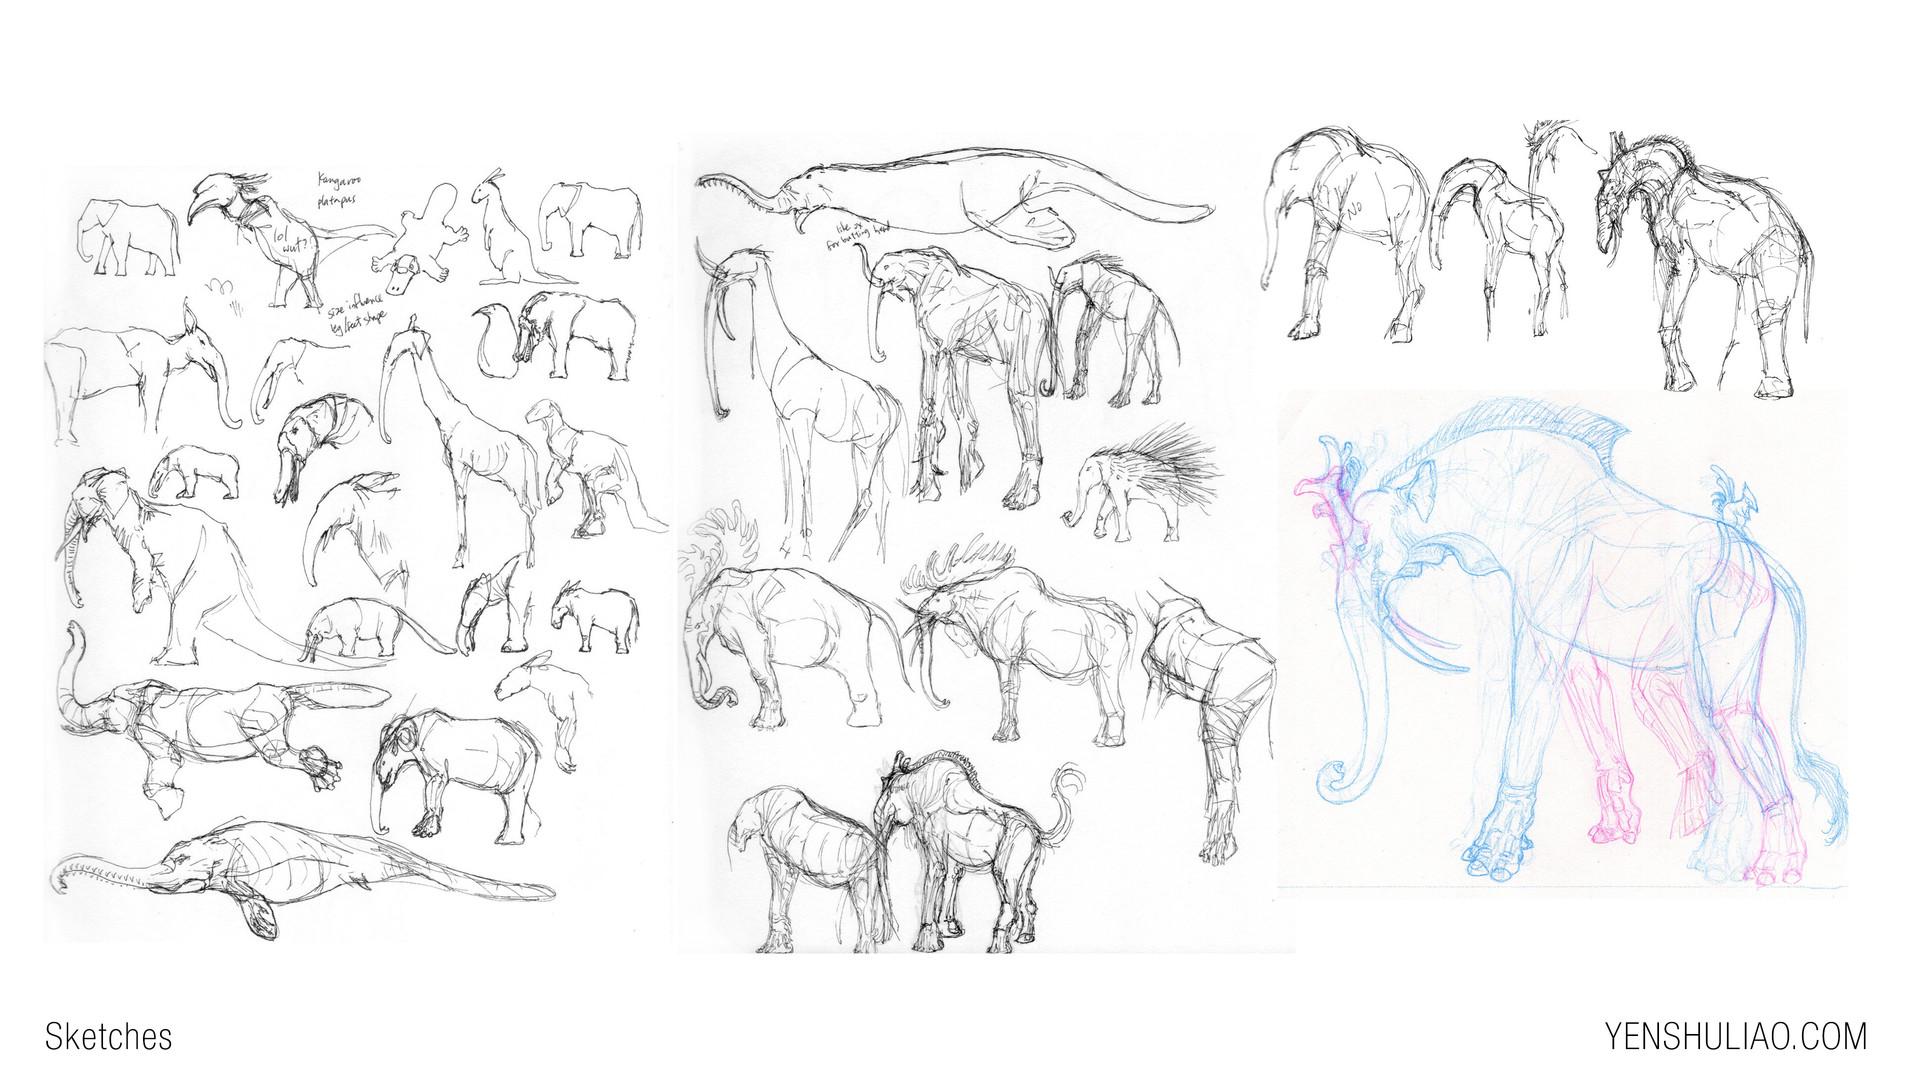 Yen shu liao creature concept art sketch elephant